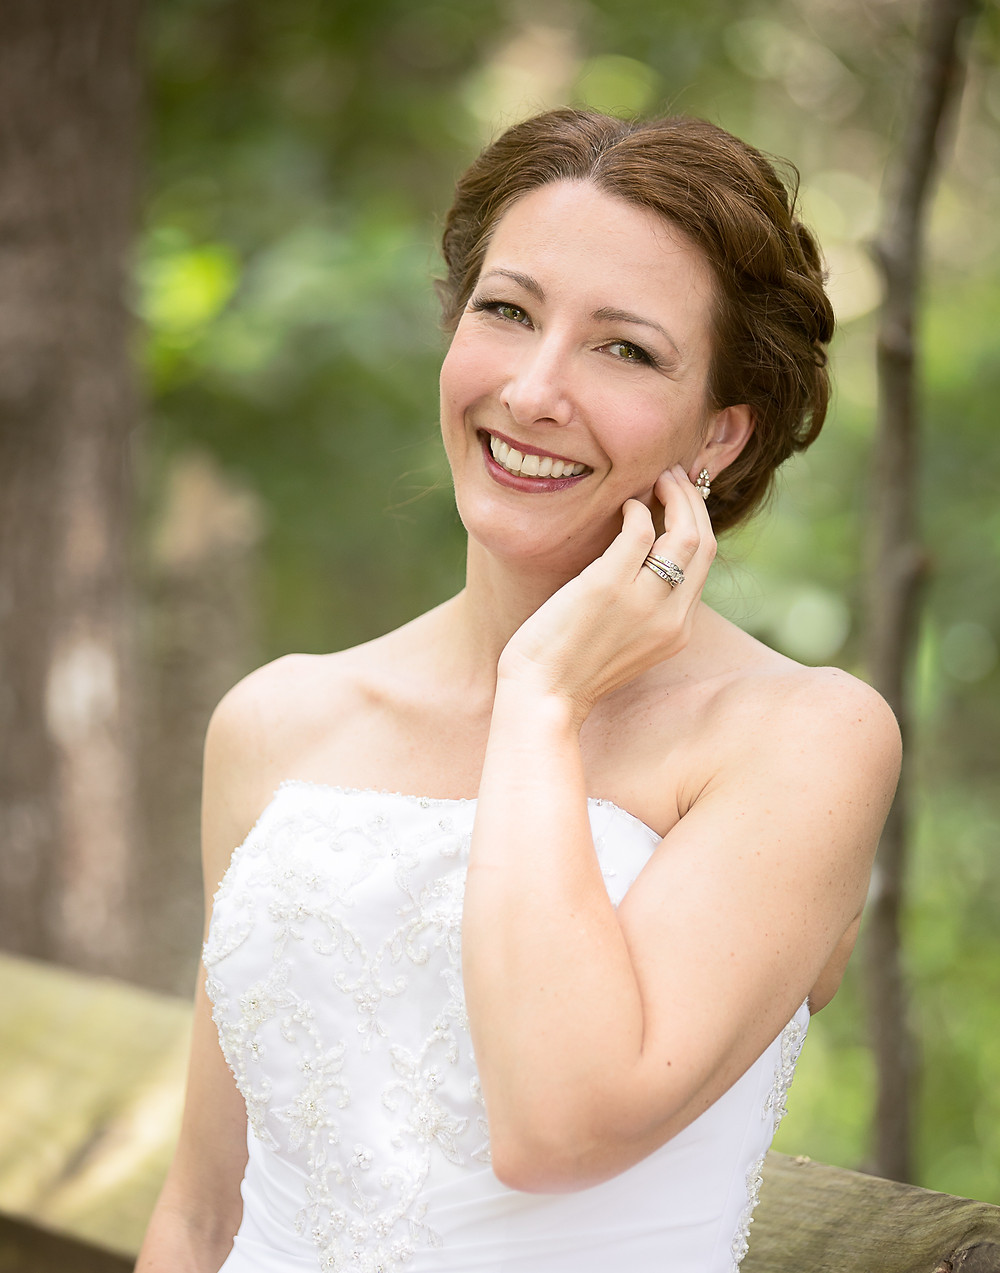 Final image: Bridal session Laur Lo in Jacksonville, Florida